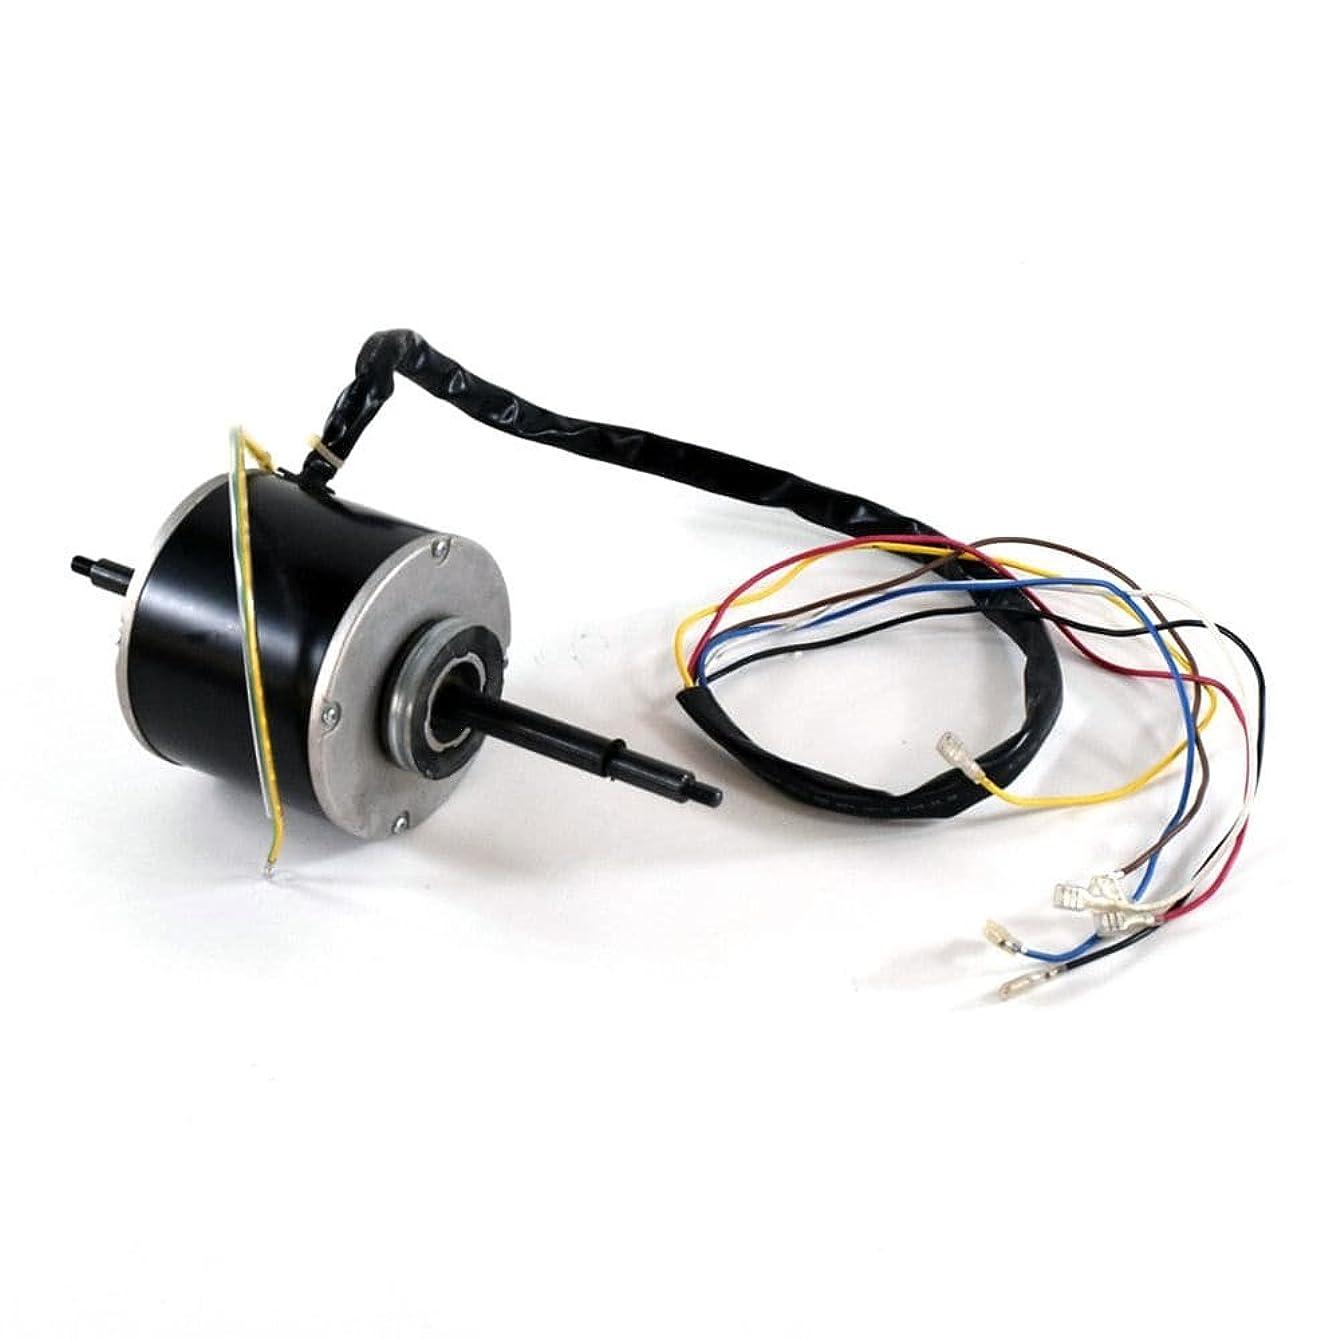 GENUINE Frigidaire 5304482622 Air Conditioner Fan Motor